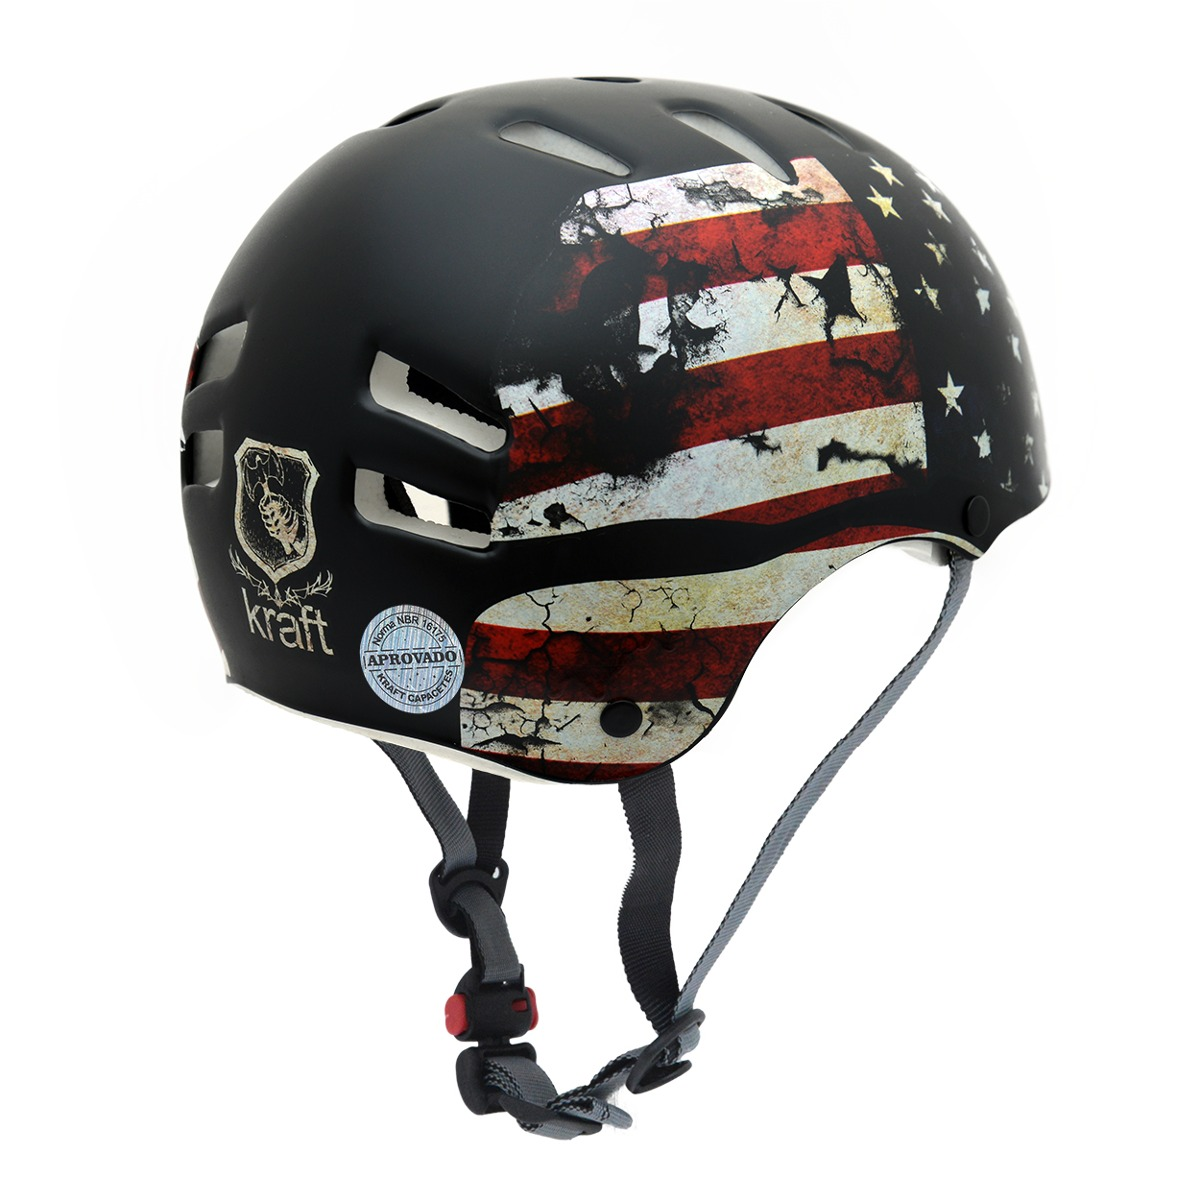 8bbc322c7 capacete infantil kraft bike usa pp skate patins nbr16175. Carregando zoom.